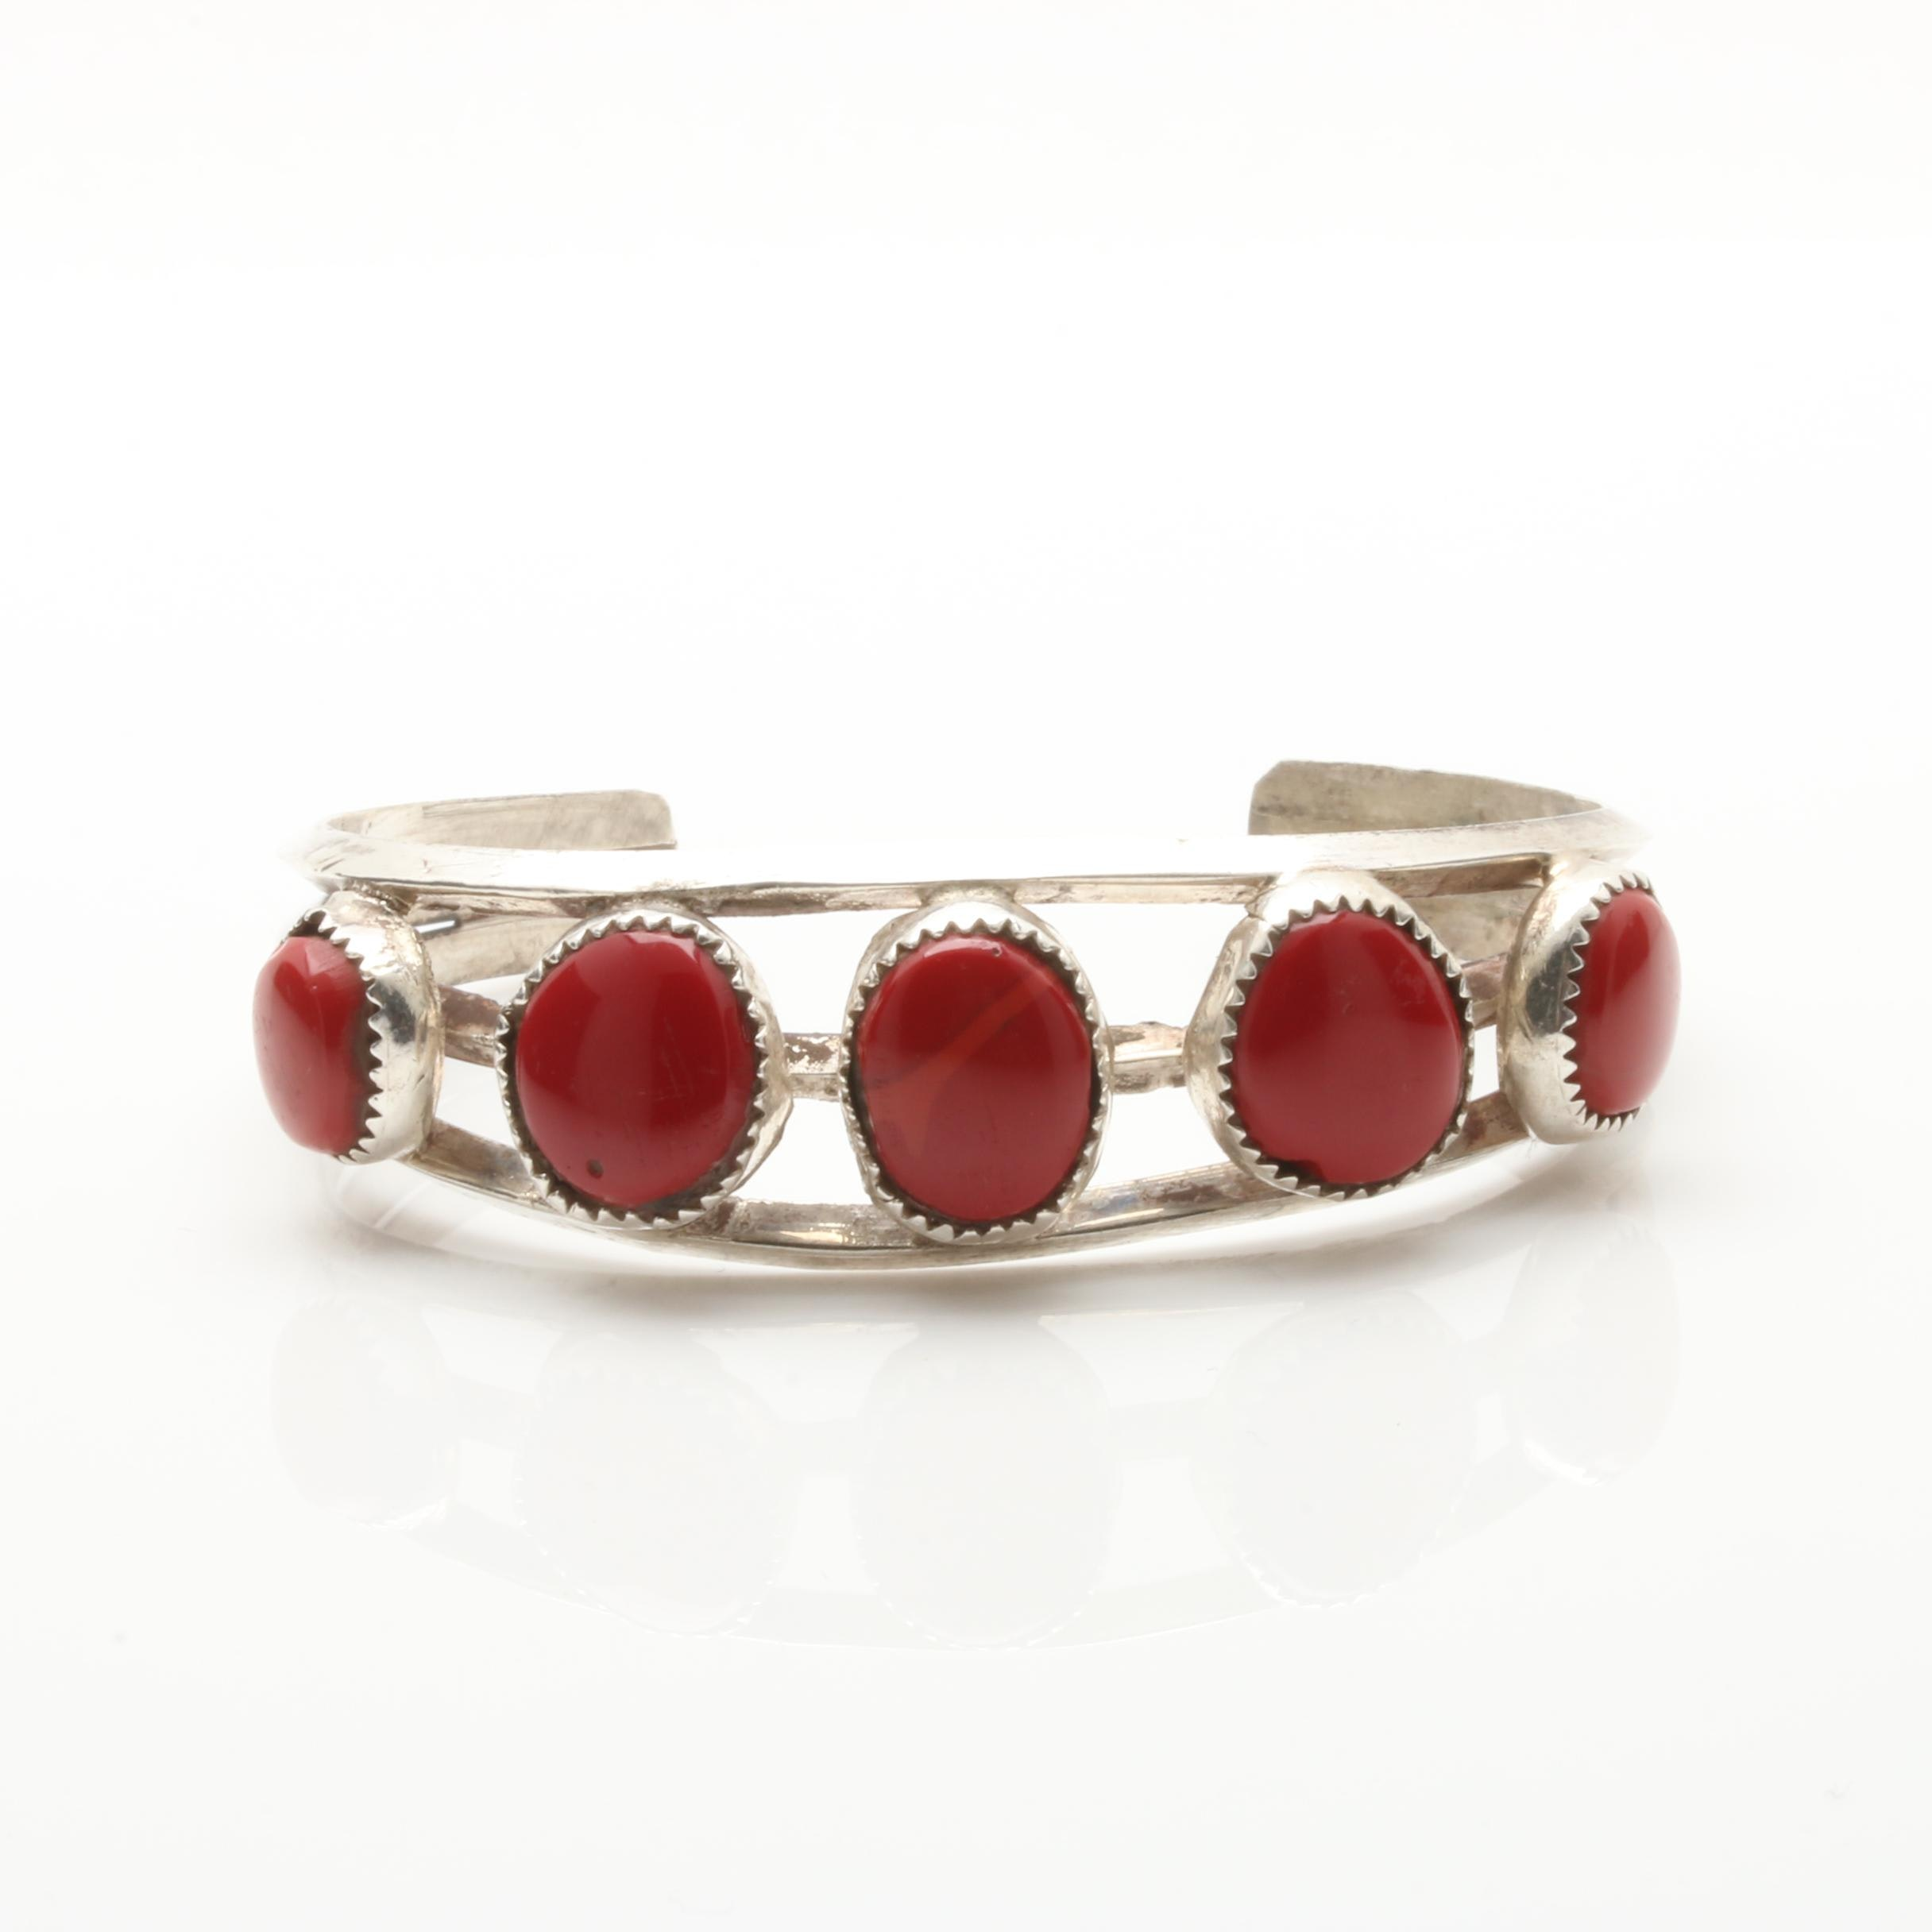 Sterling Silver Imitation Coral Cuff Bracelet